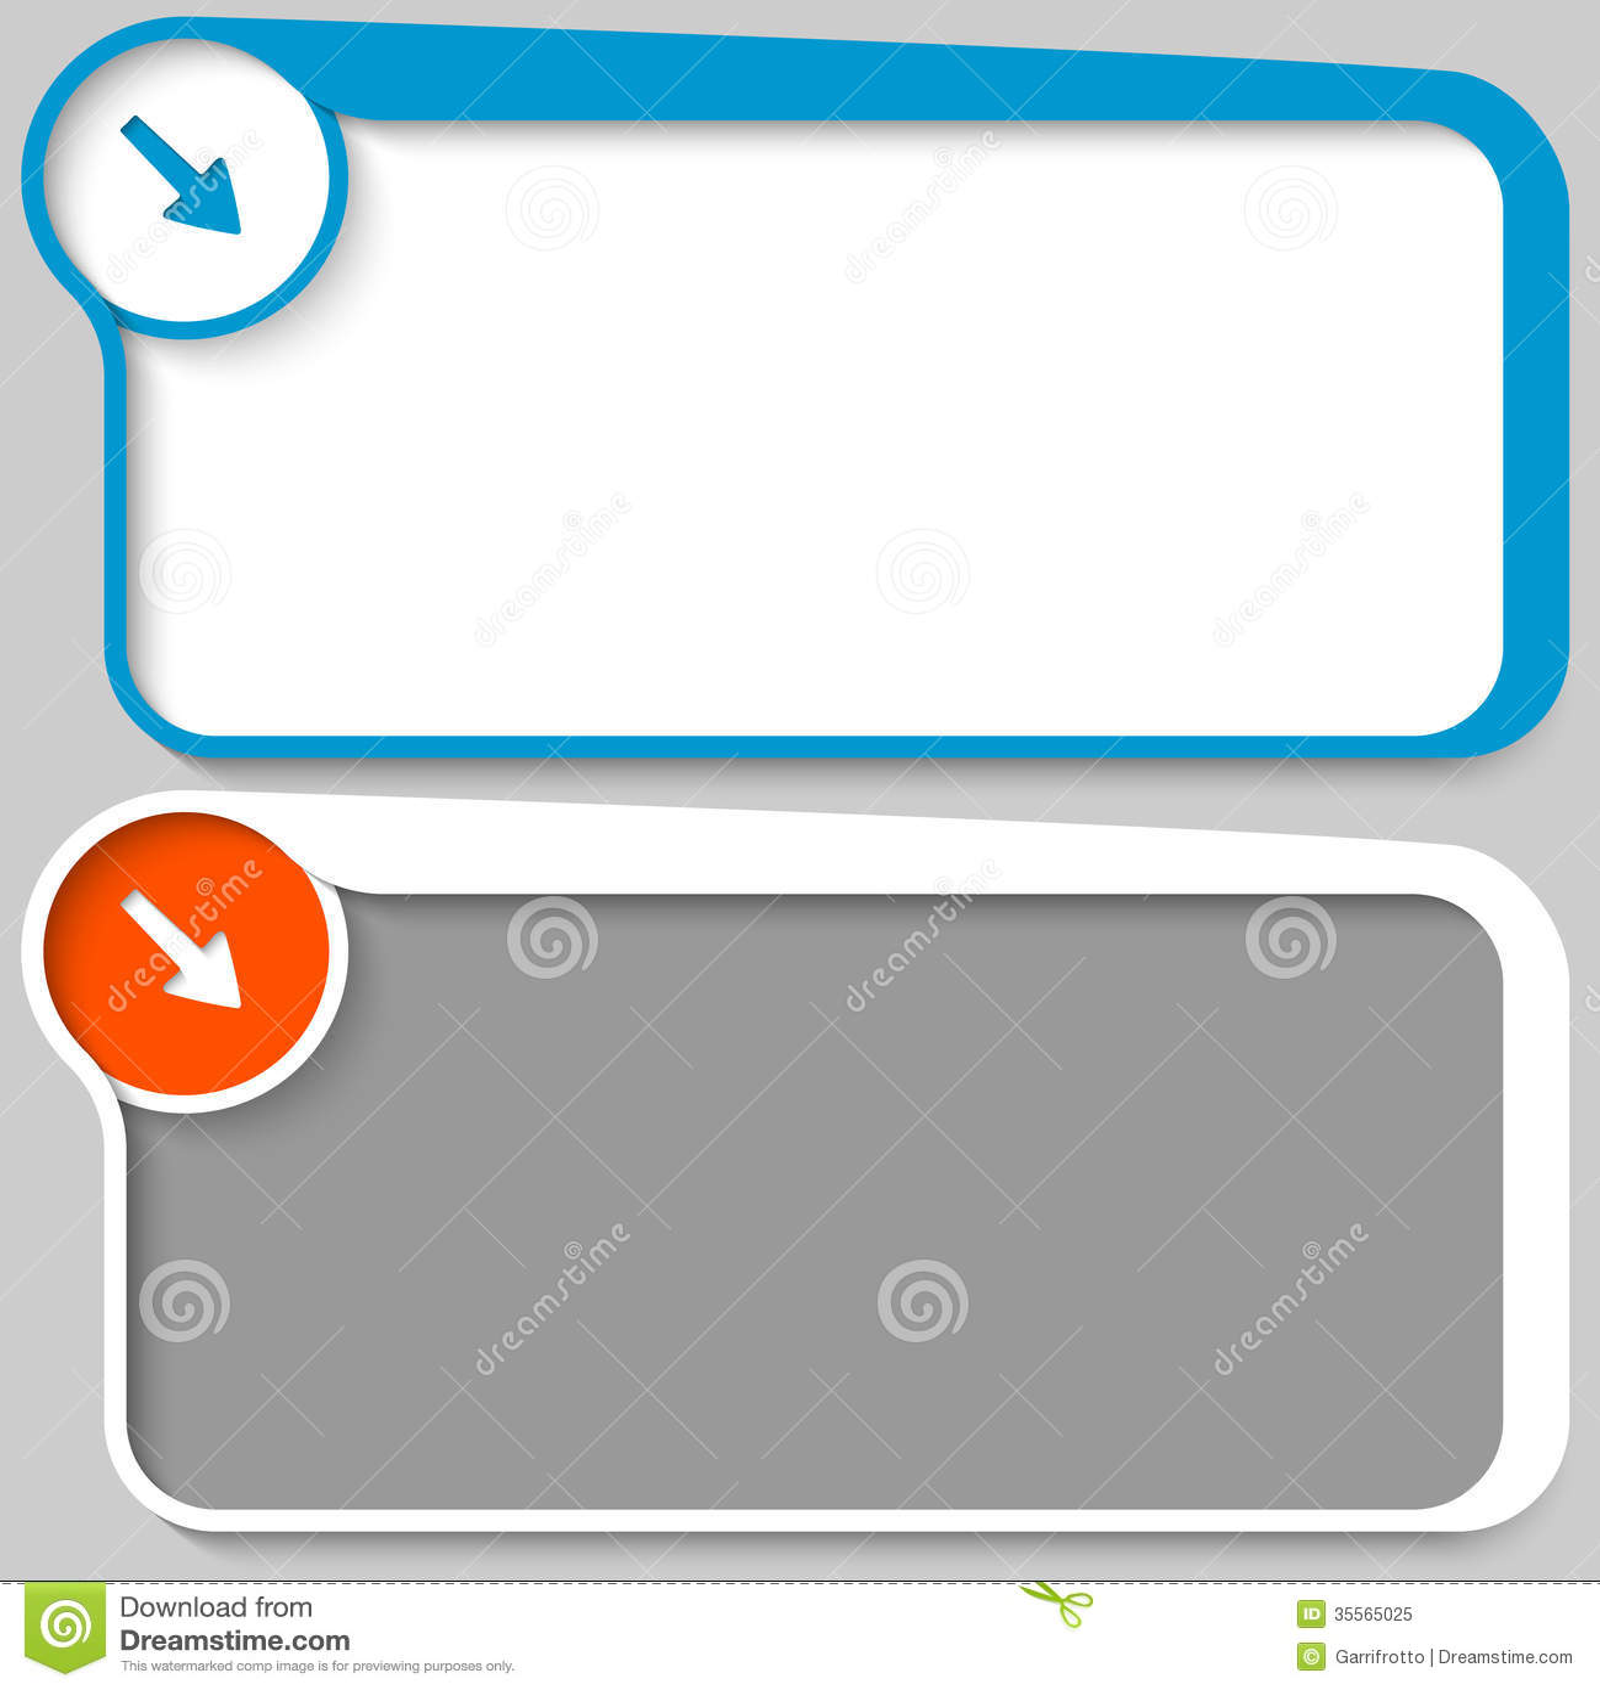 Text Box And Arrow Royalty Free Stock Photo - Image: 35565025